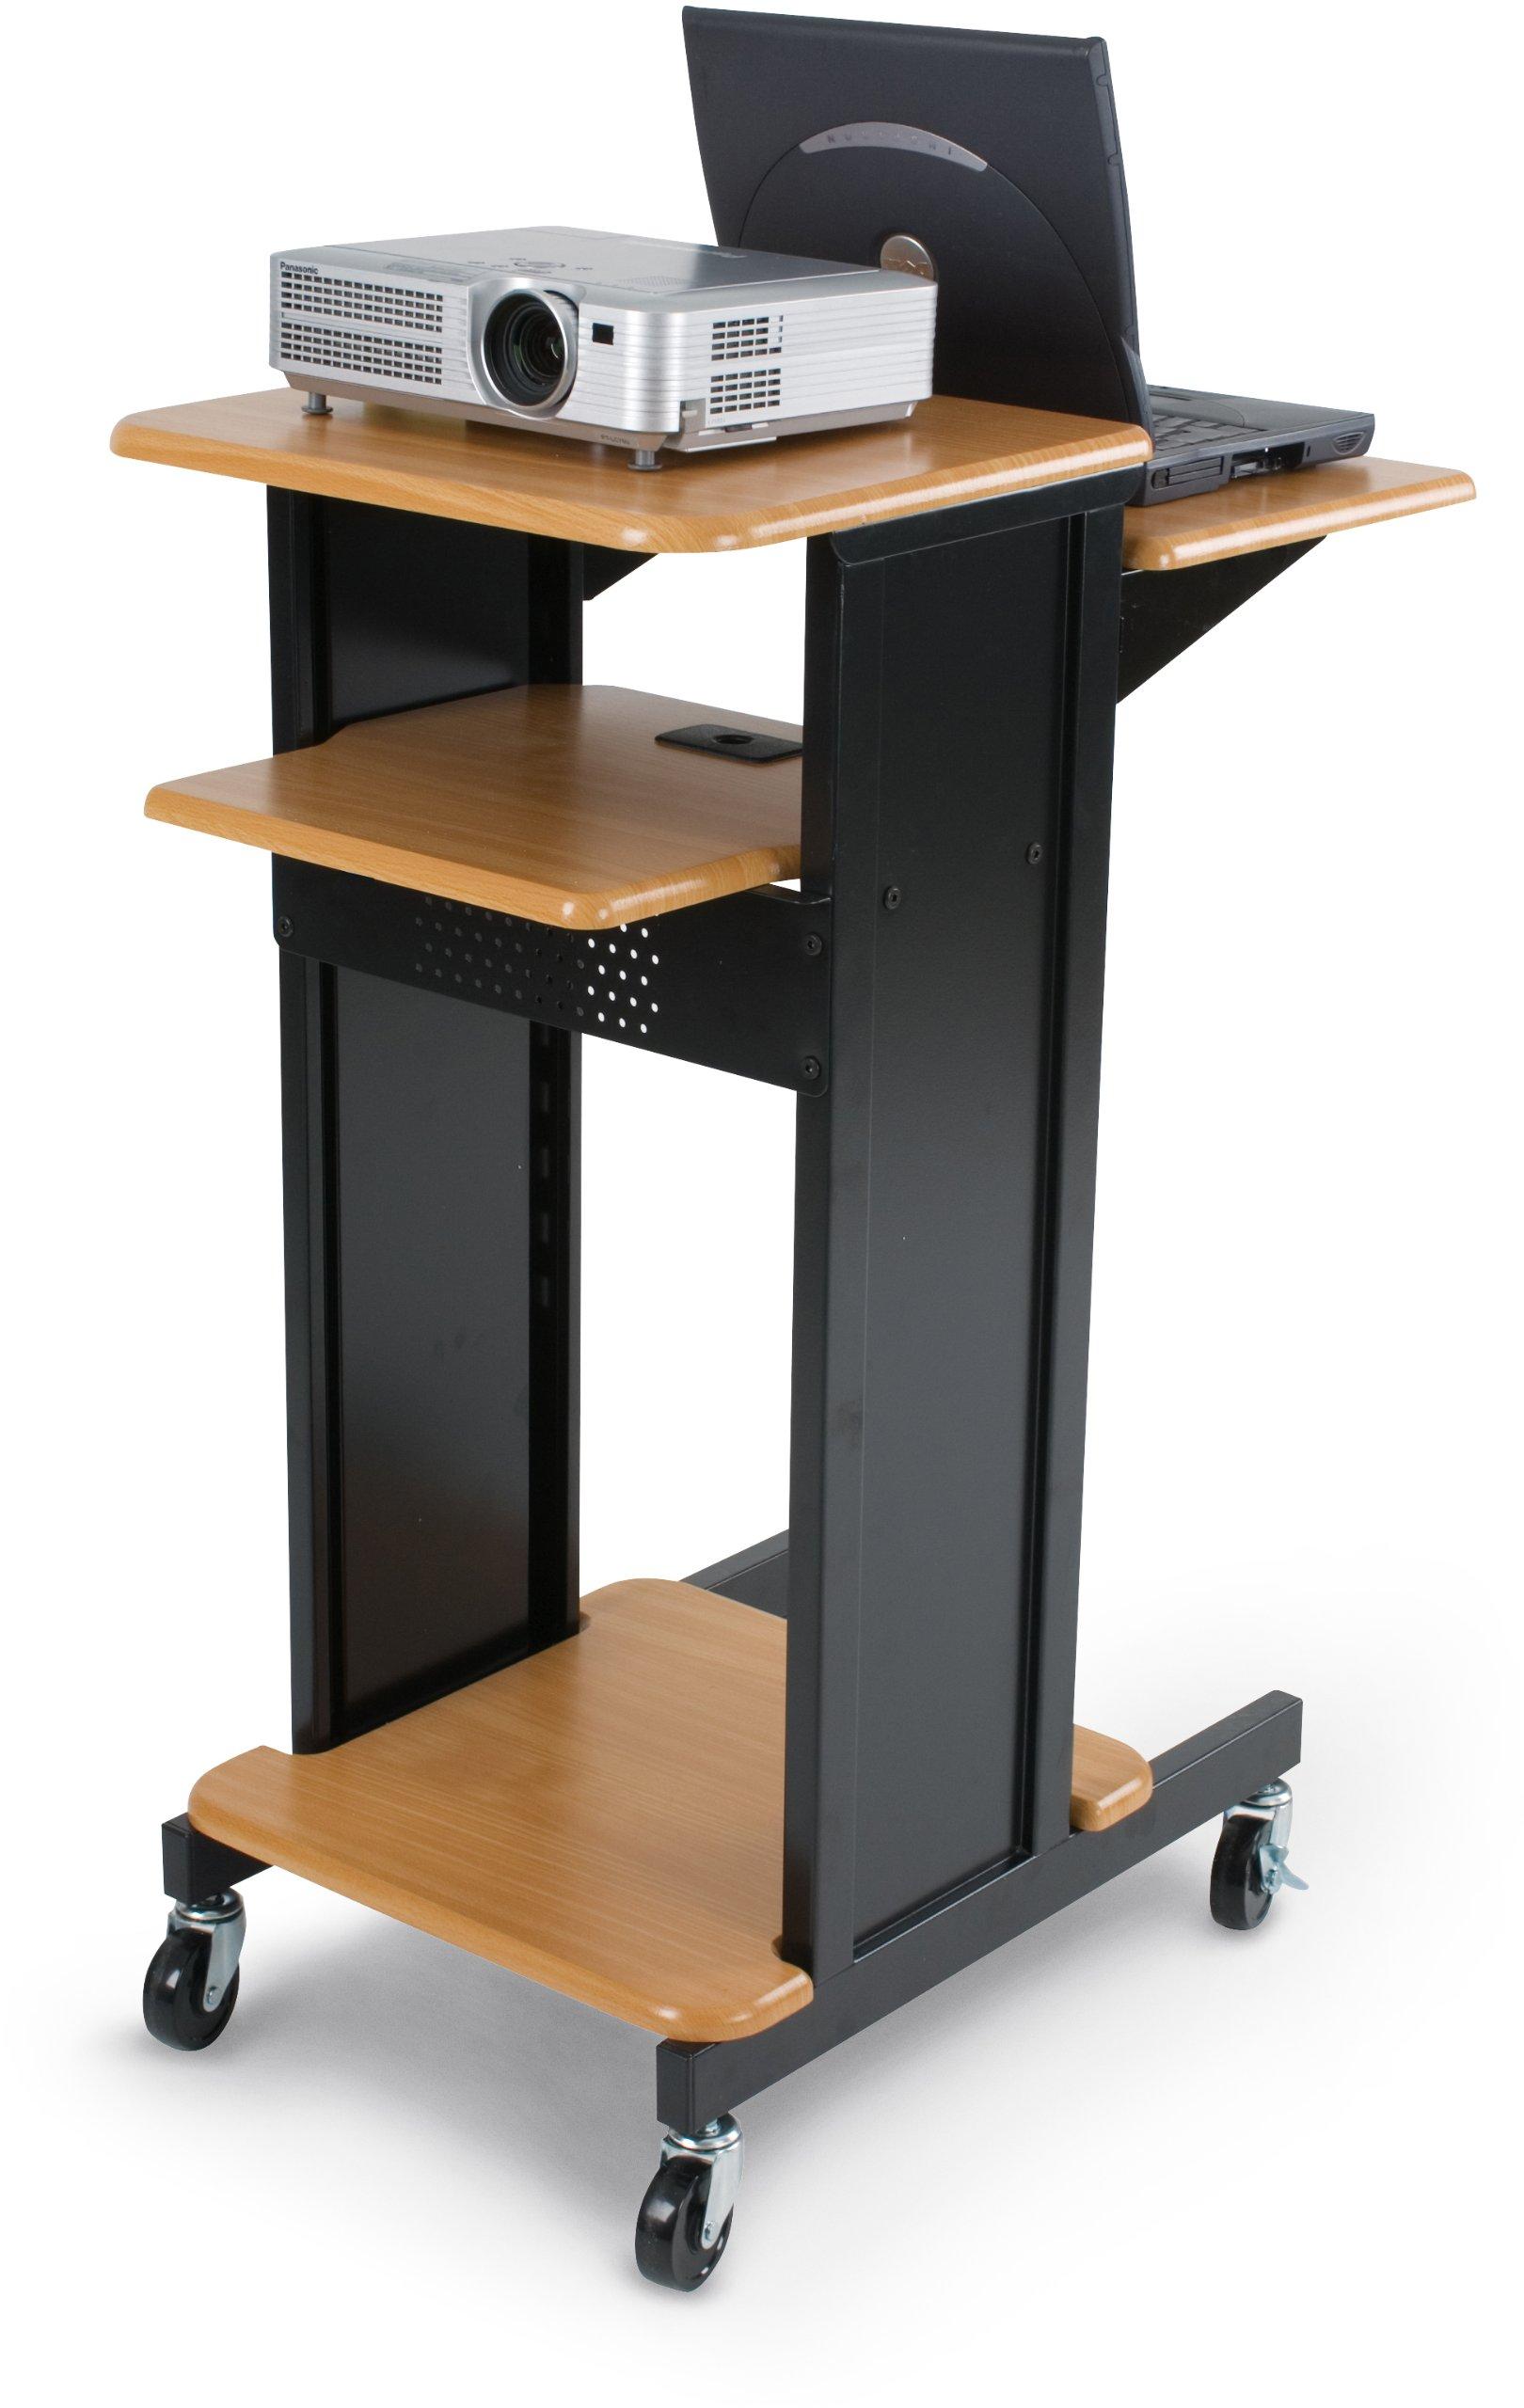 BALT Audio Visual Adjustable Presentation Cart, Teak Black, 40.25''H x 18''W x 30''D (27519) by Balt